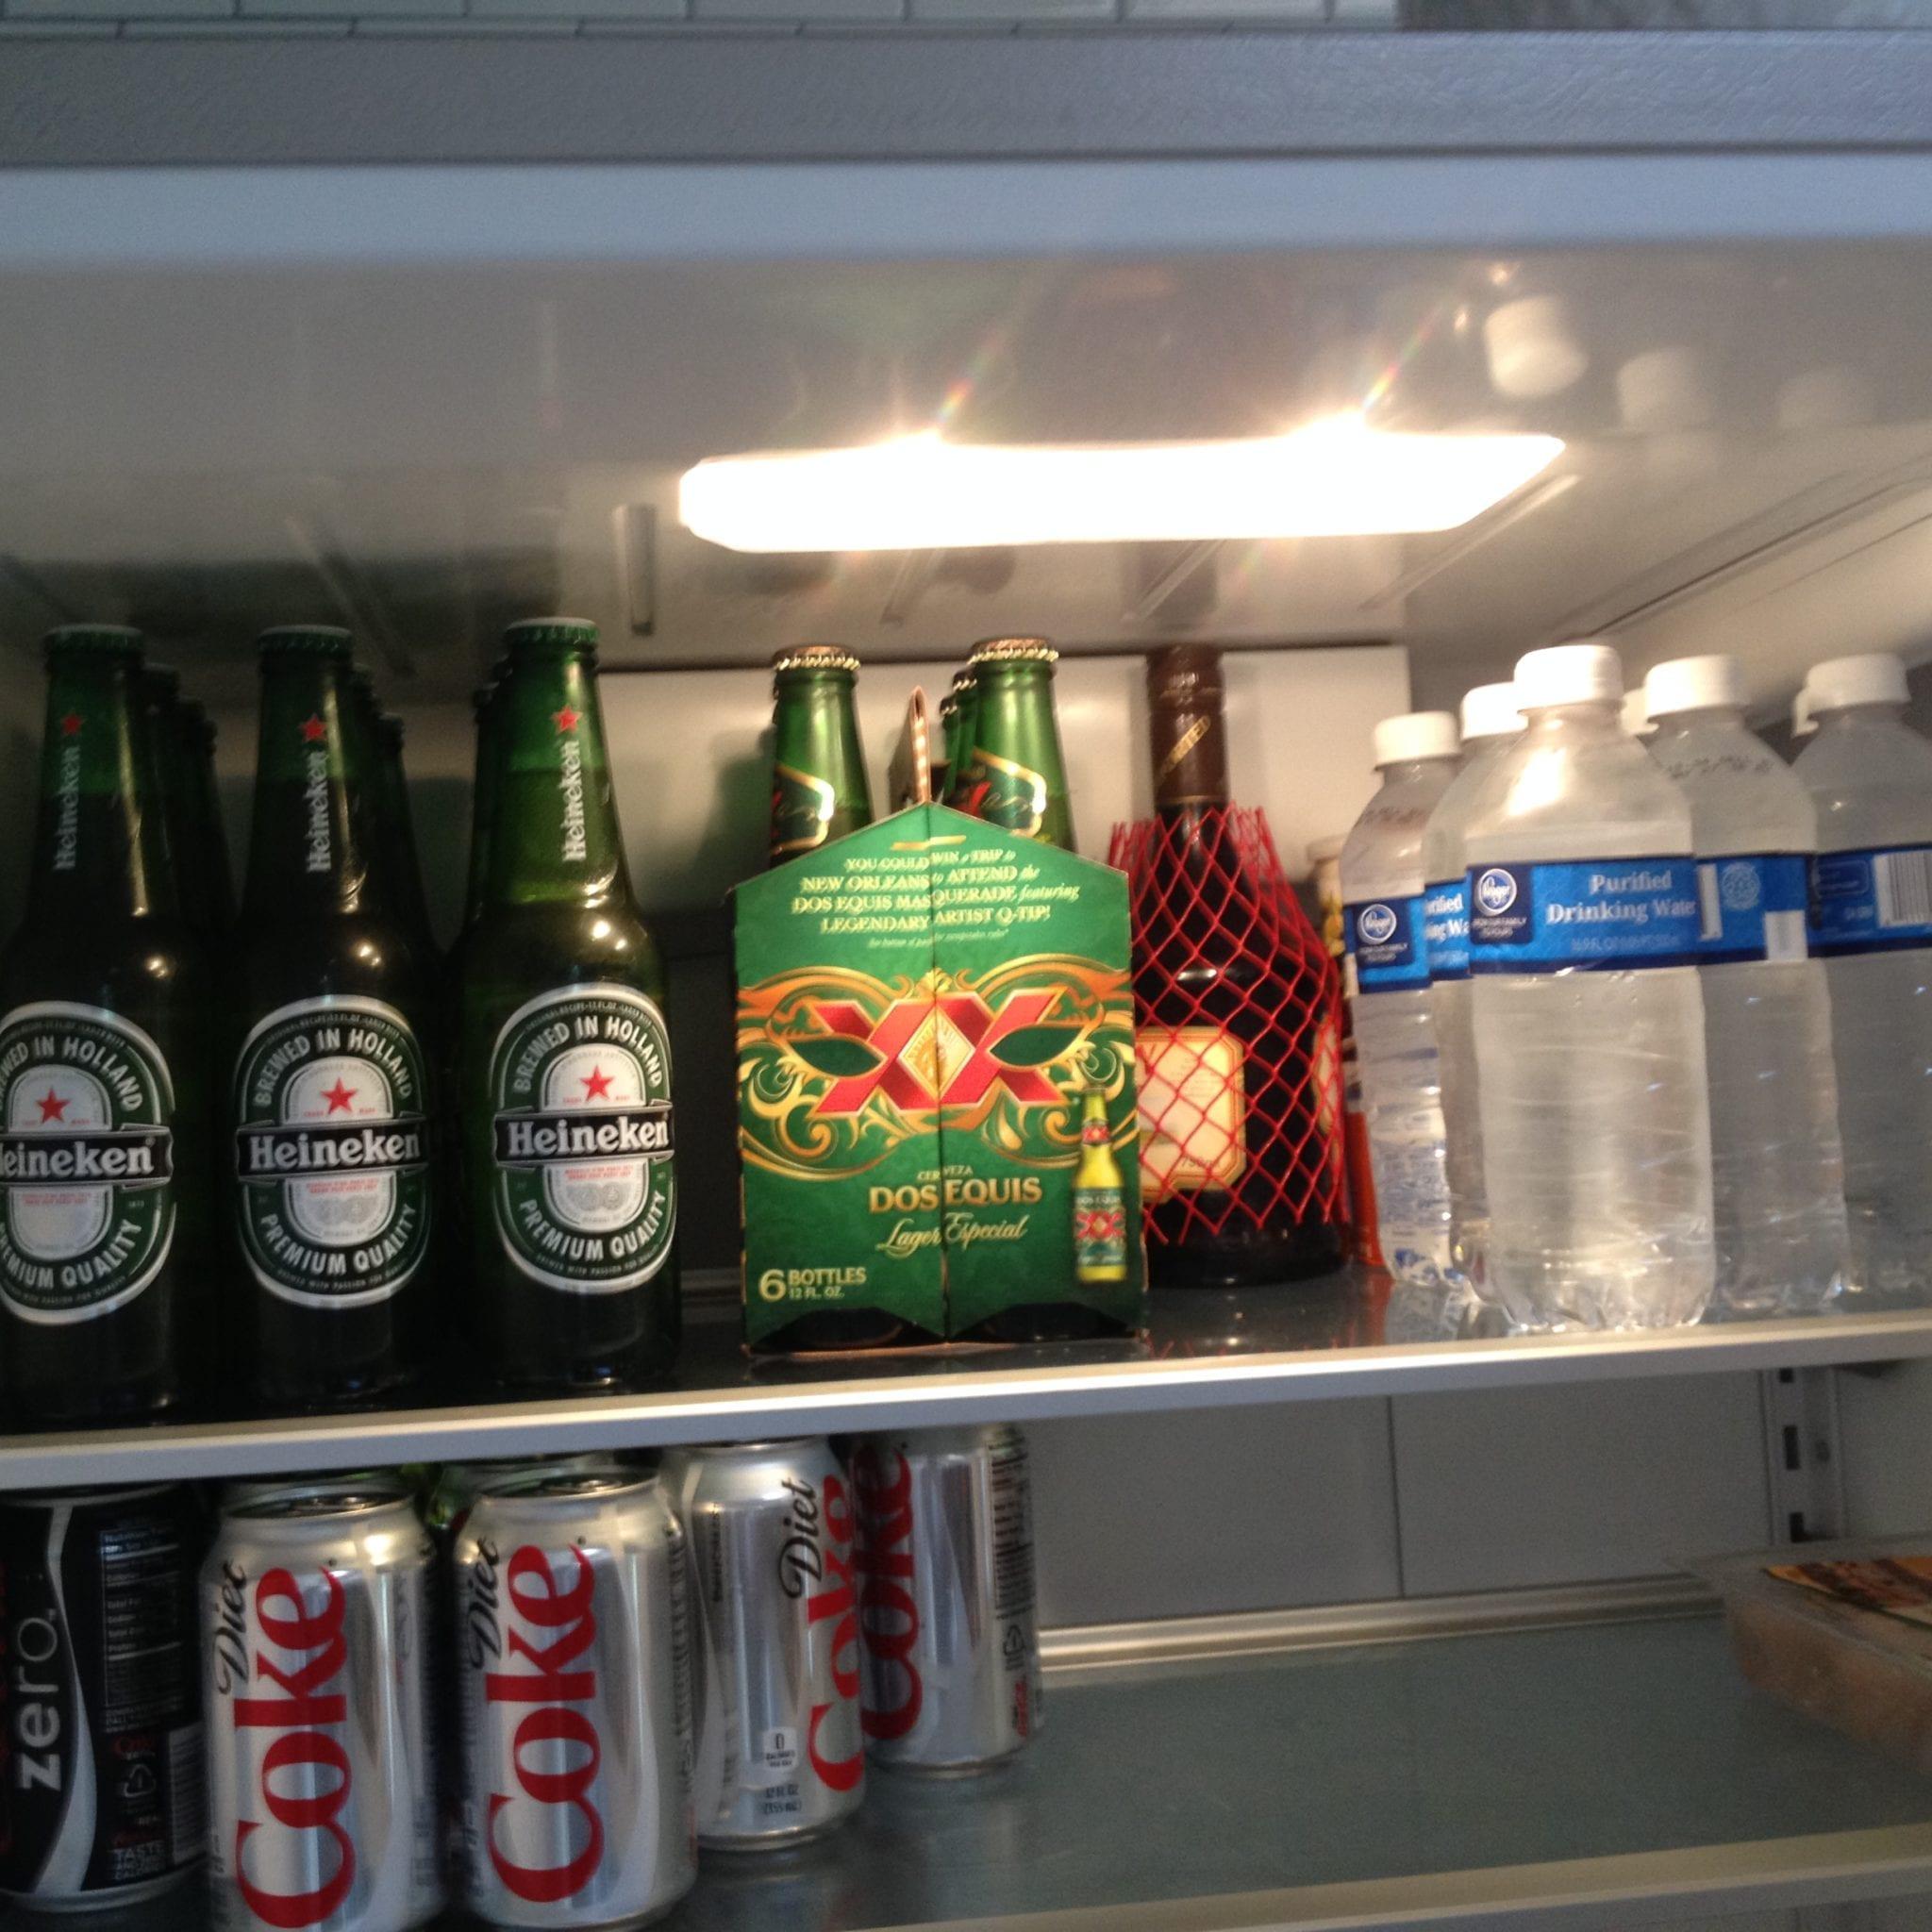 Horror and Heineken